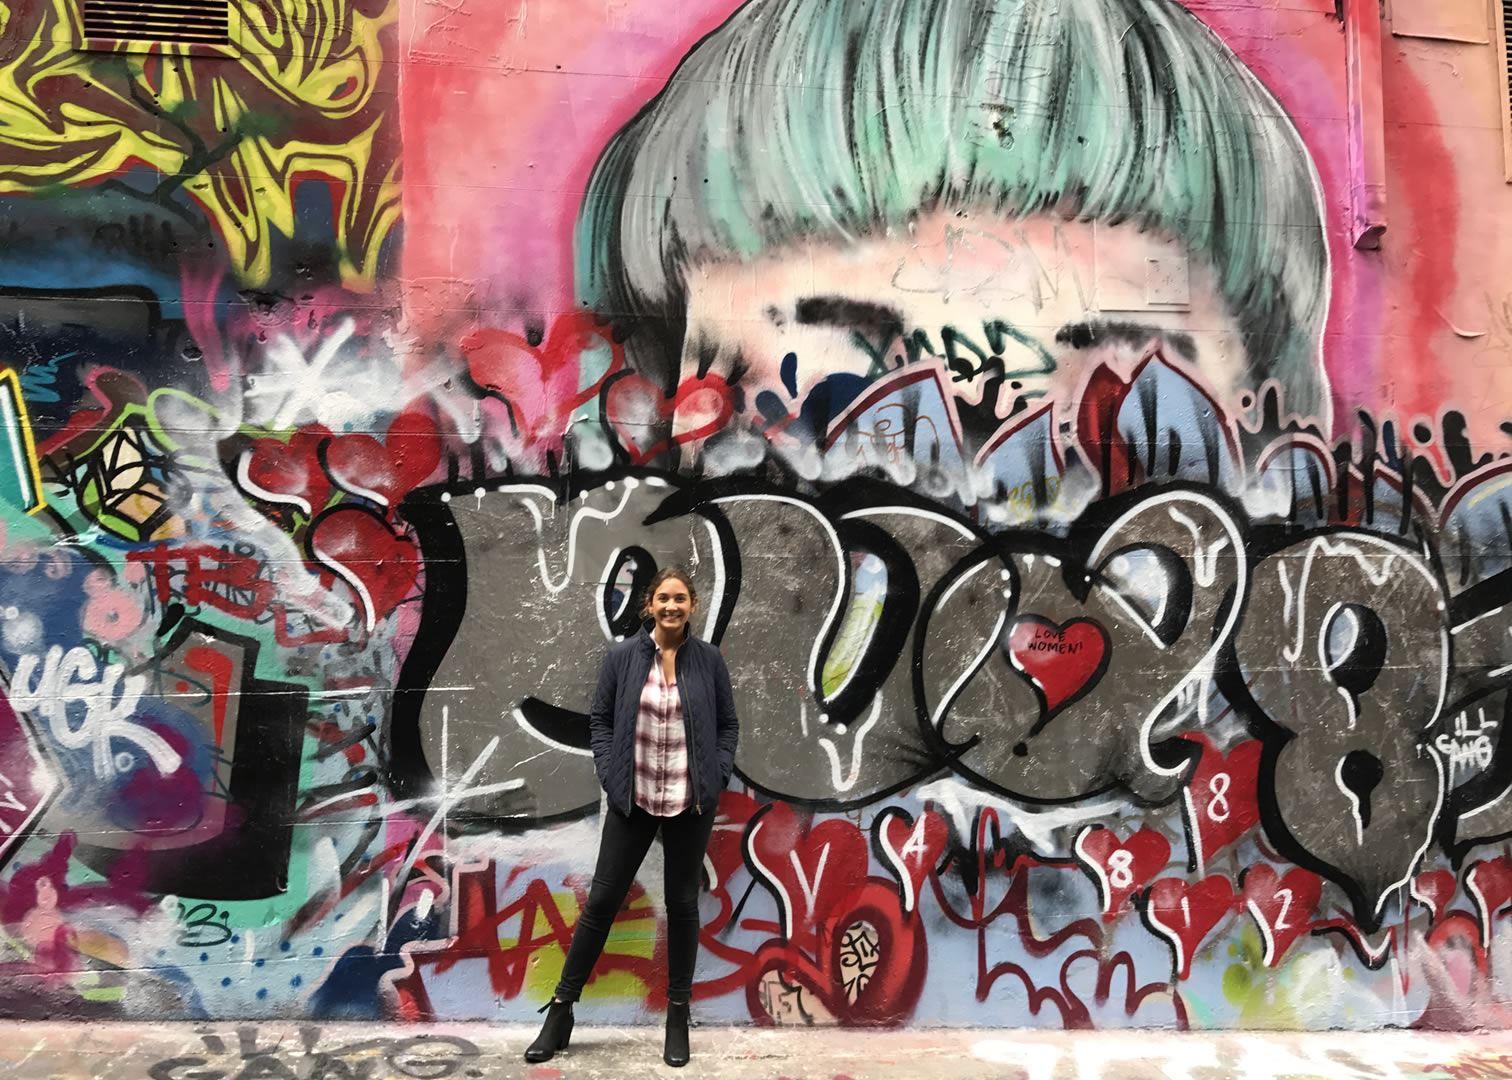 Danielle In Front Of Graffiti Street Art In Melbourne